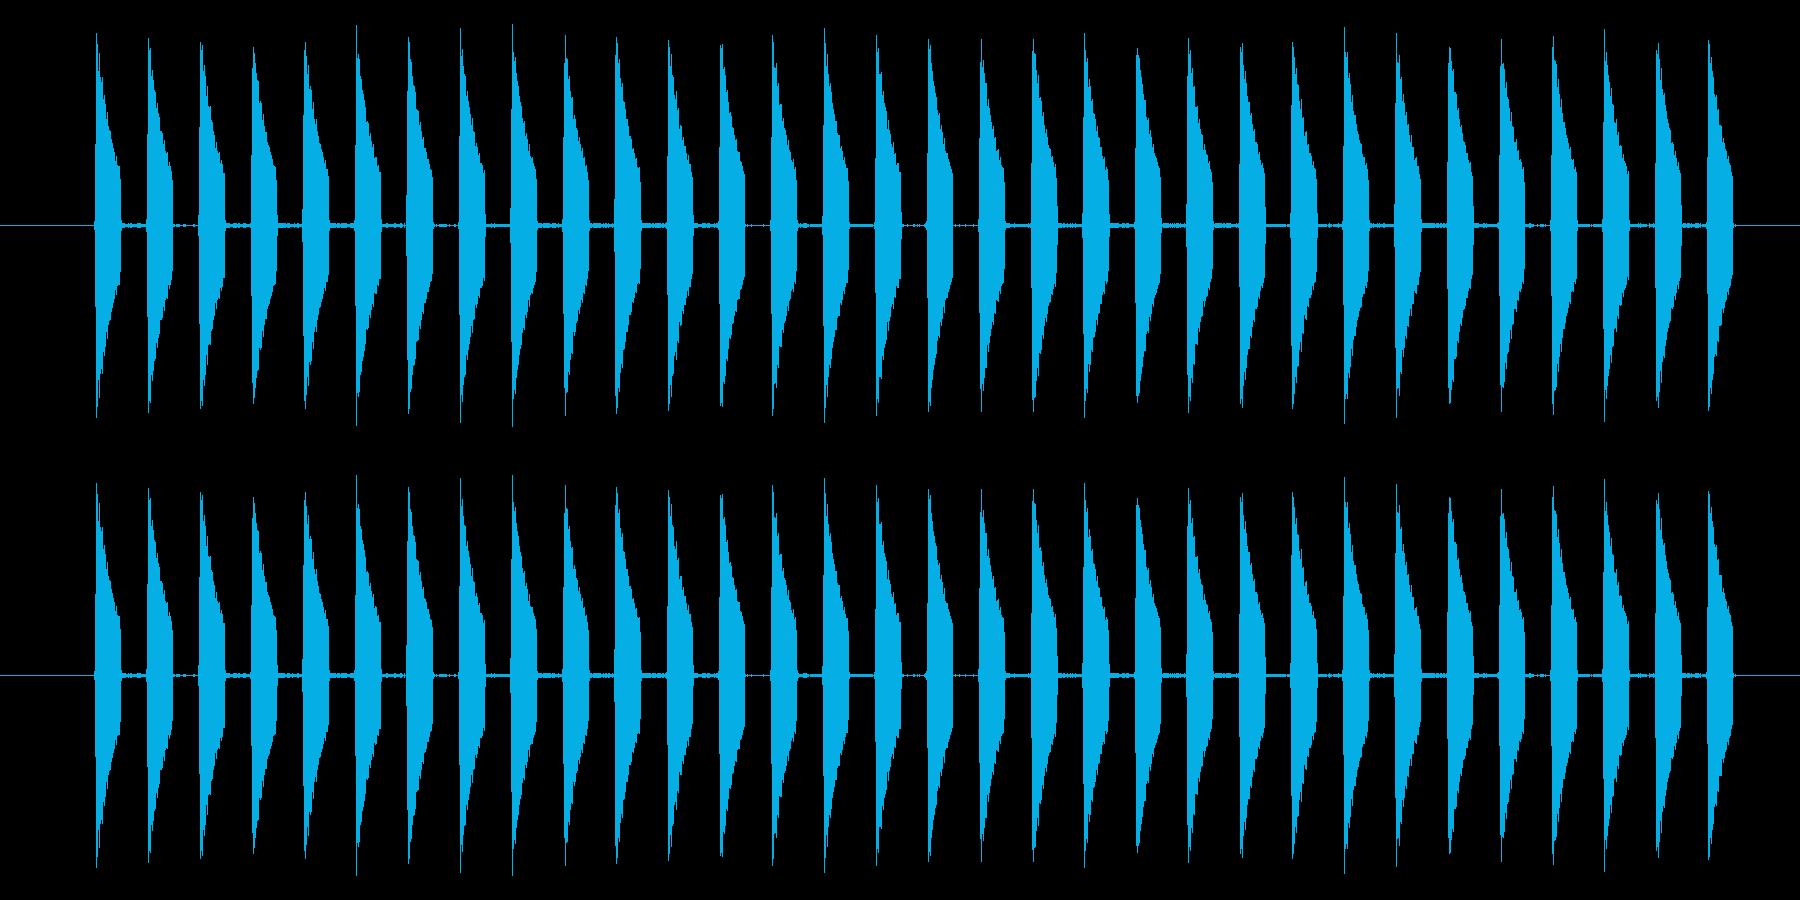 NES アクション01-16(スコア)の再生済みの波形